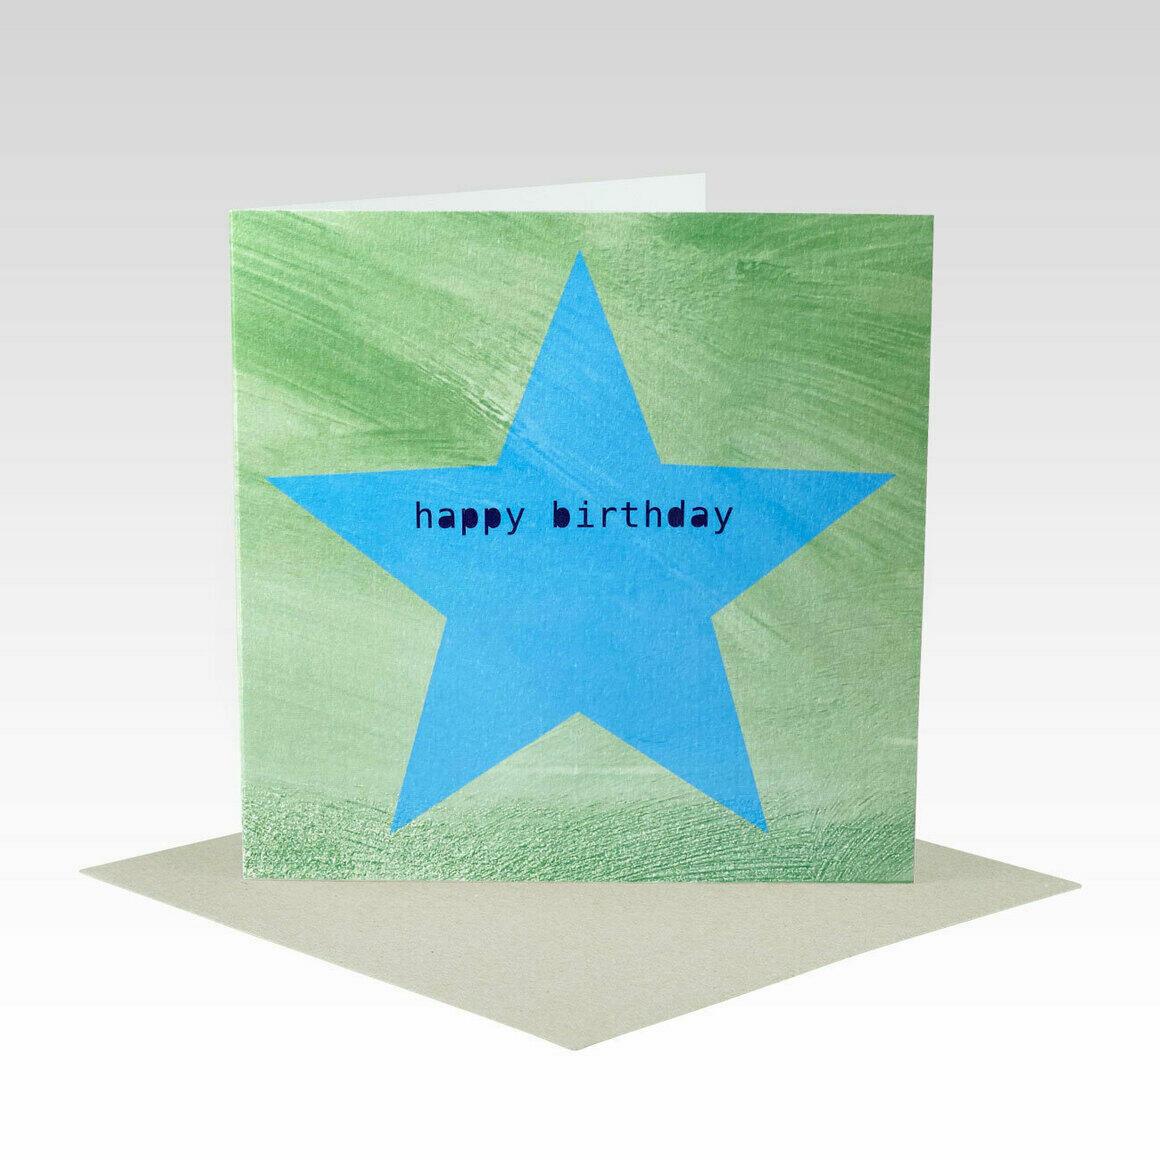 HB086 – Blue Green Star Birthday Card   Trada Marketplace